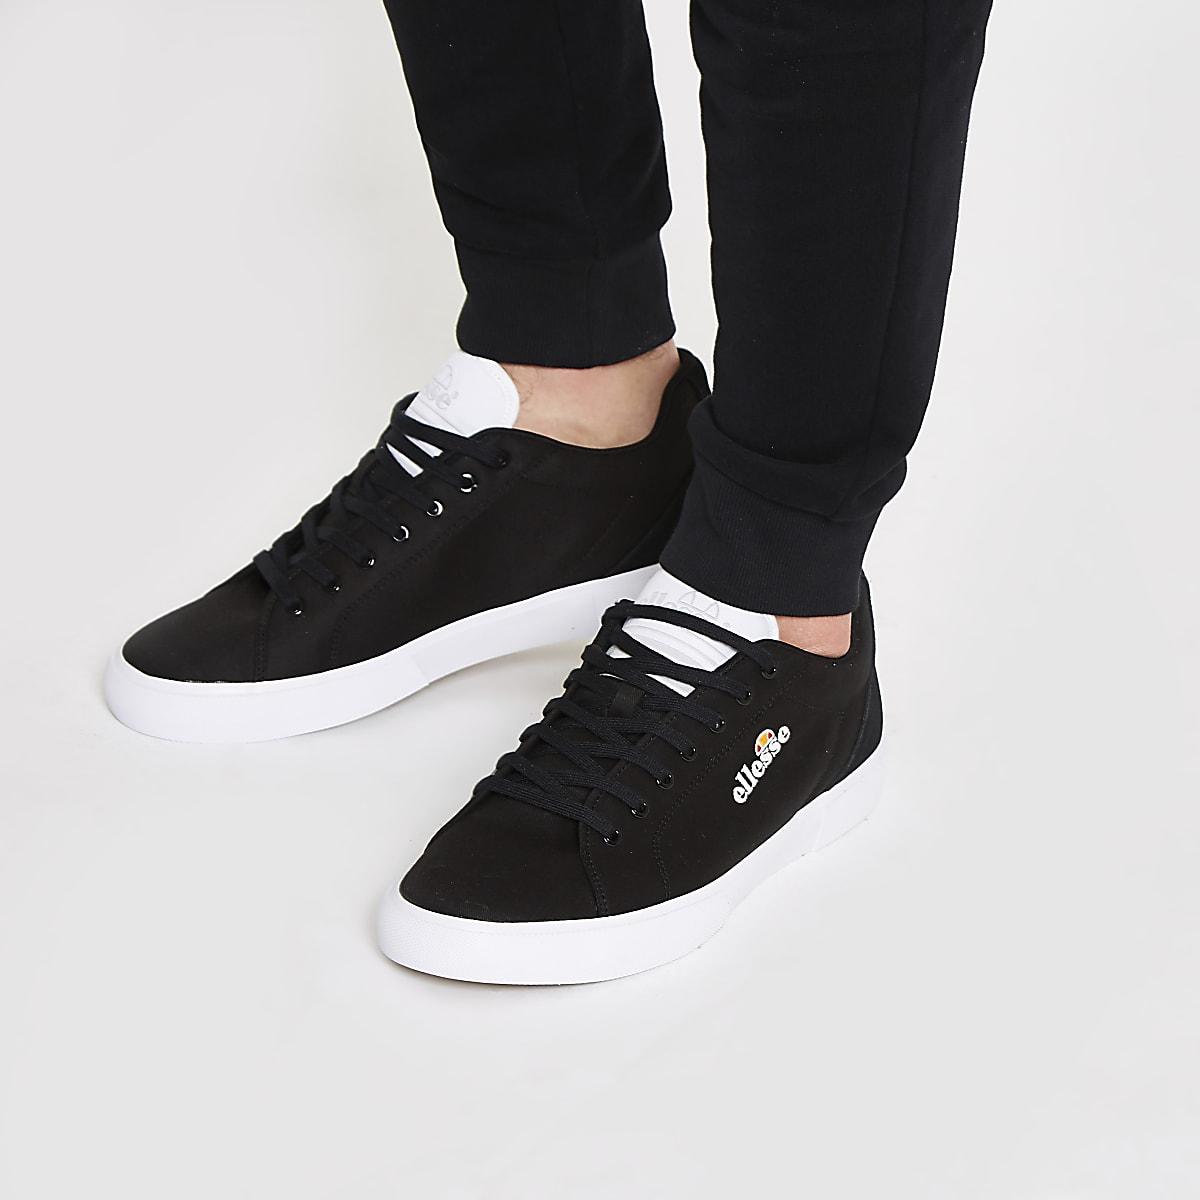 Ellesse Taggia – Toile Chaussures Baskets En Noires eEHI29YWD